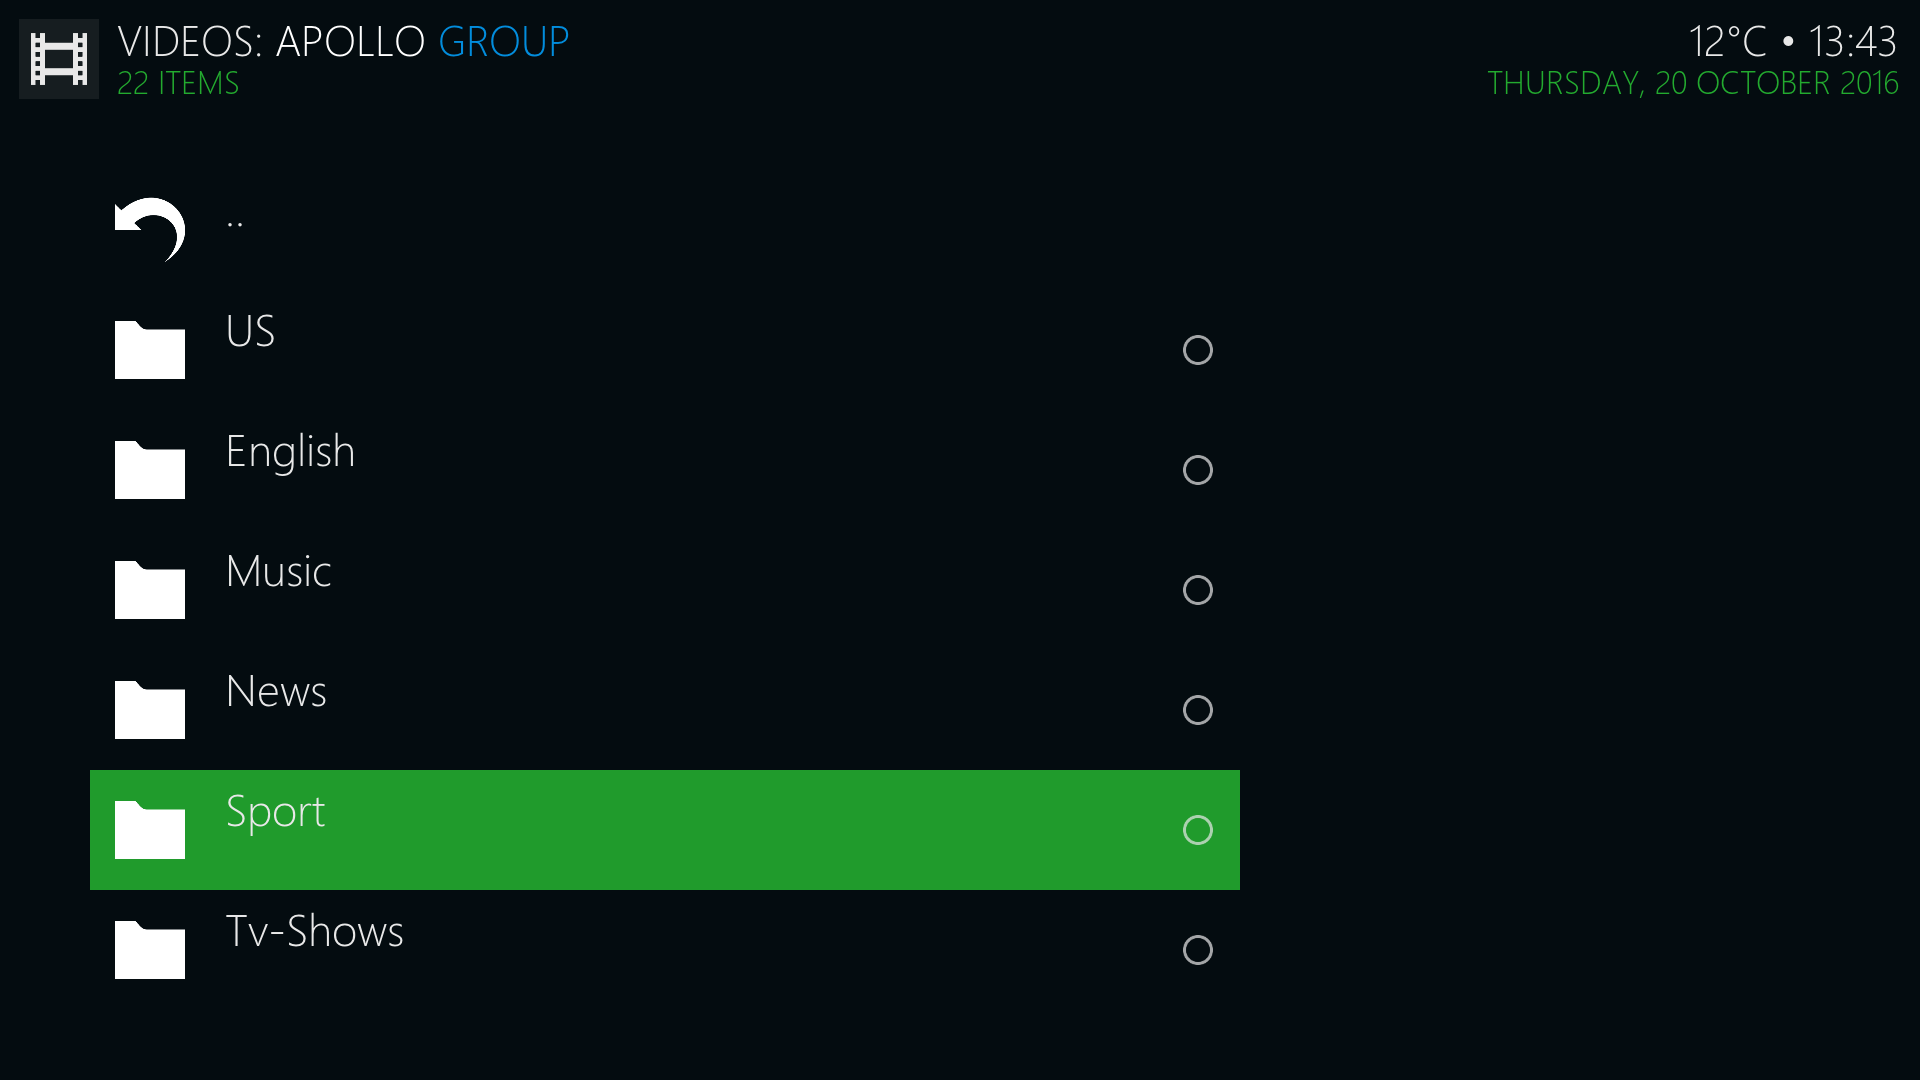 screenshot-2016-10-20-13-43-08